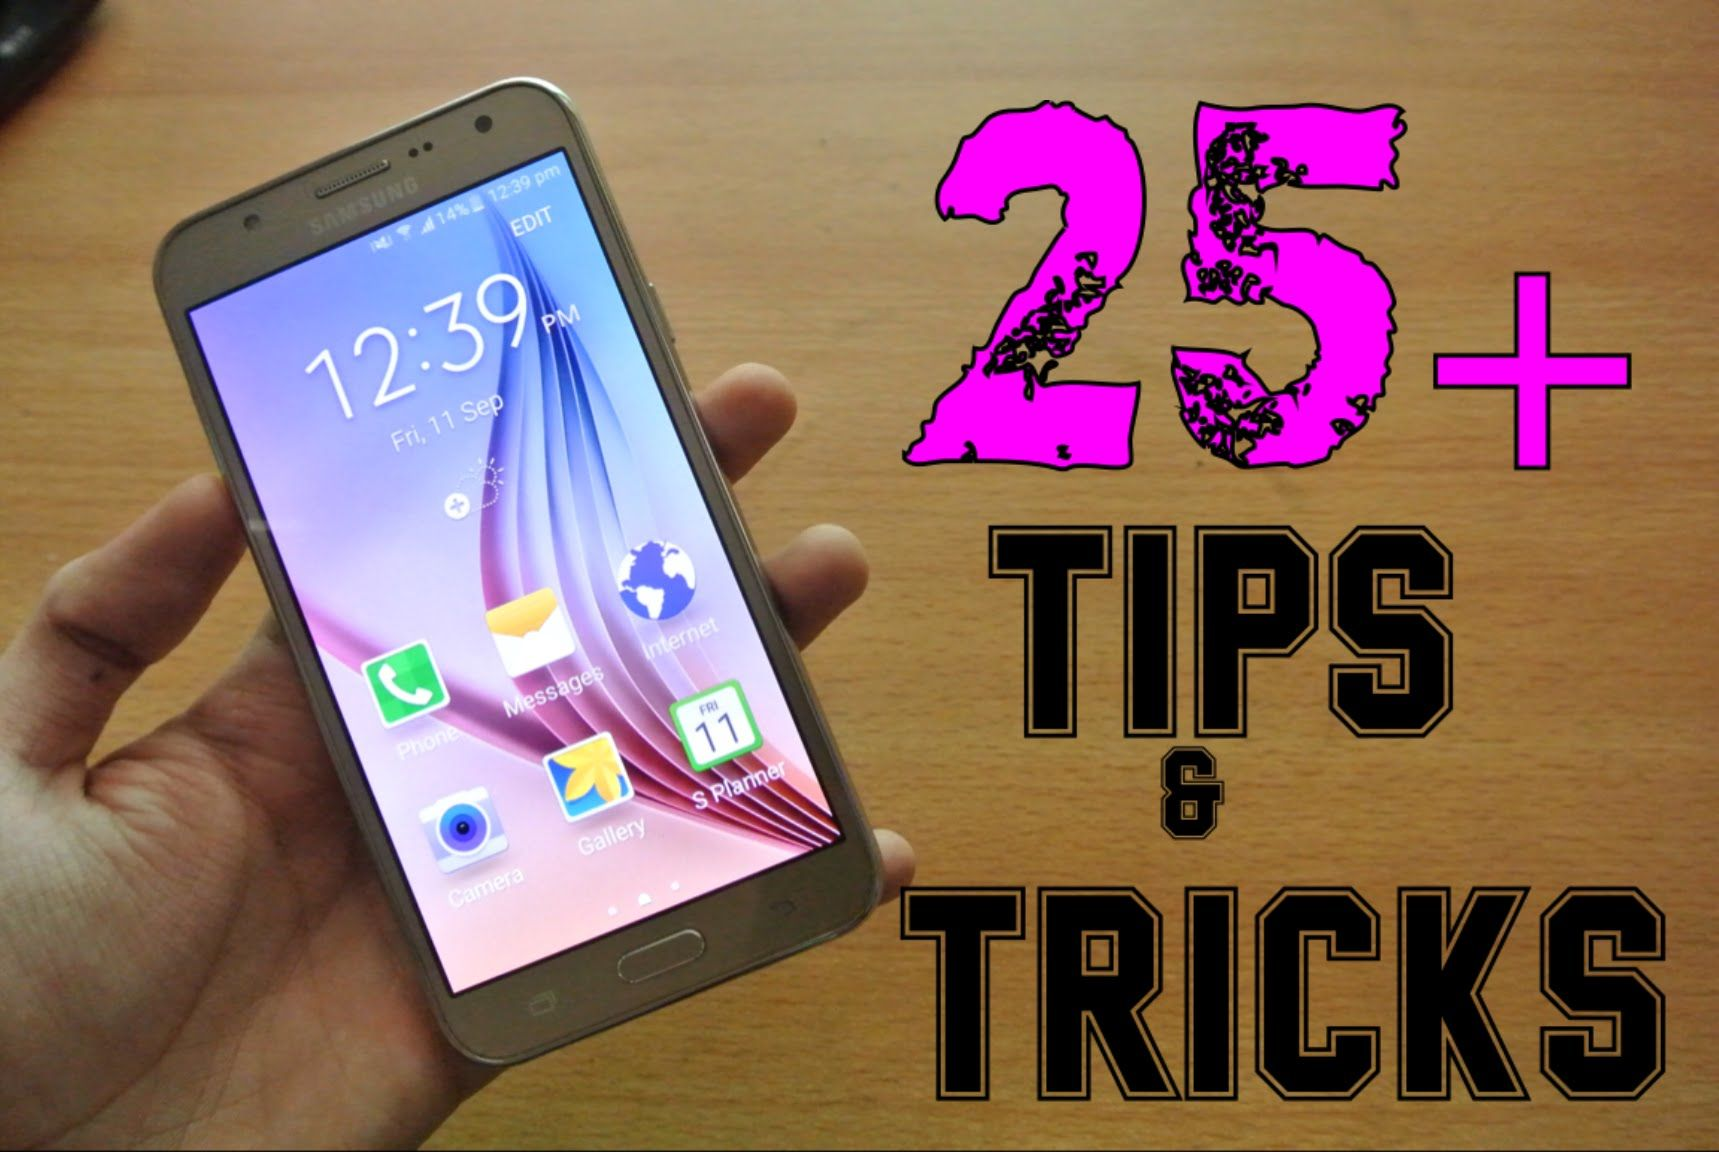 Samsung Galaxy J7 - 20+ Tips & Tricks HD